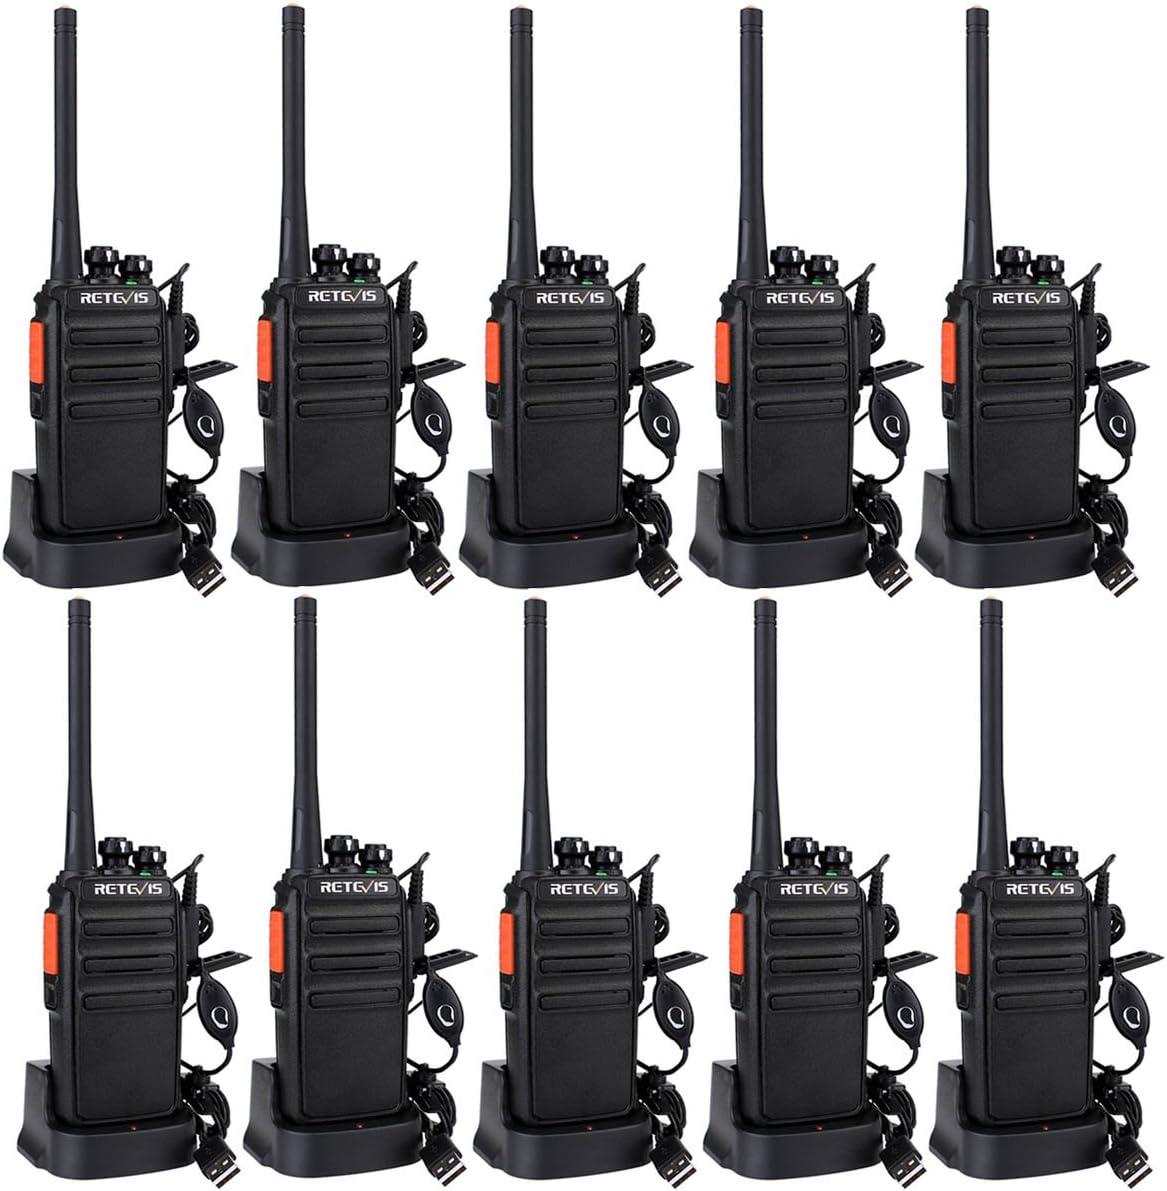 Retevis RT24 Walkie Talkie Profesionales PMR446 sin Licencia 16 Canales CTCSS DCS Walkie Talkie Recargable con Cargador USB Walkies Profesionales con Auriculars (5 Pares,Negro)